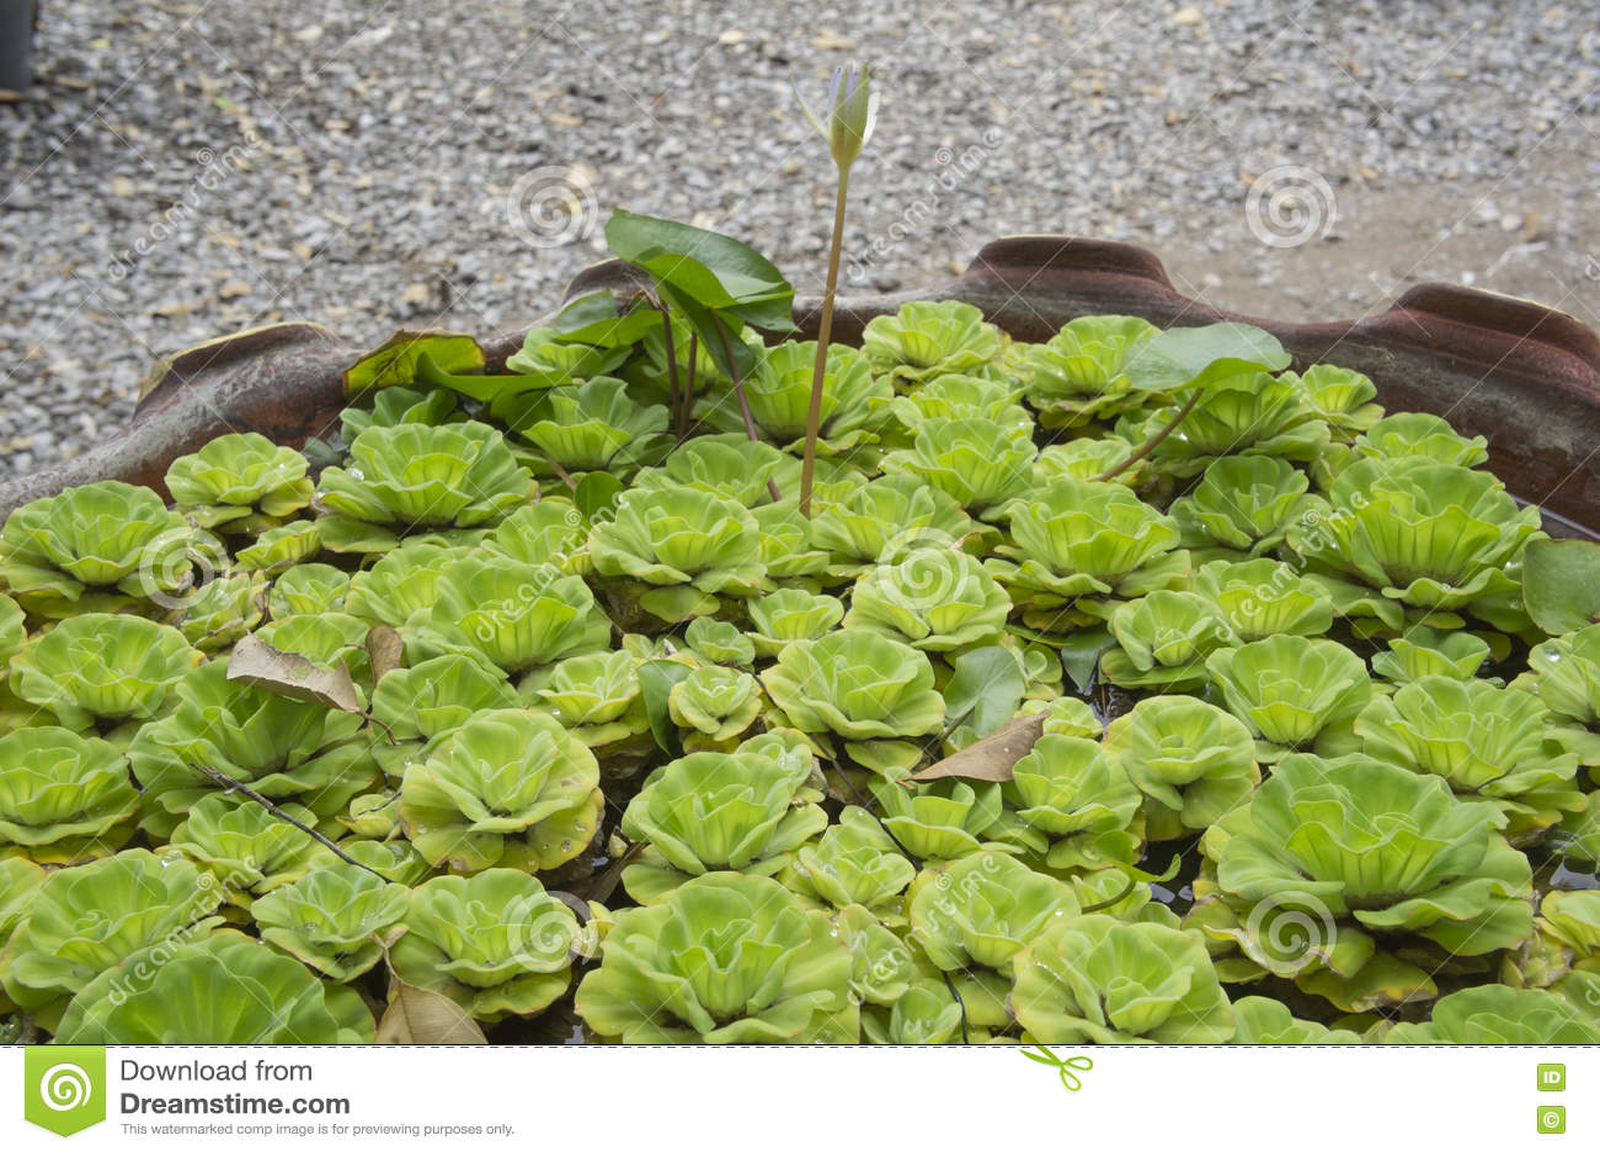 Flor De Loto Verde En La Charca De Cerámica Foto De Archivo Imagen